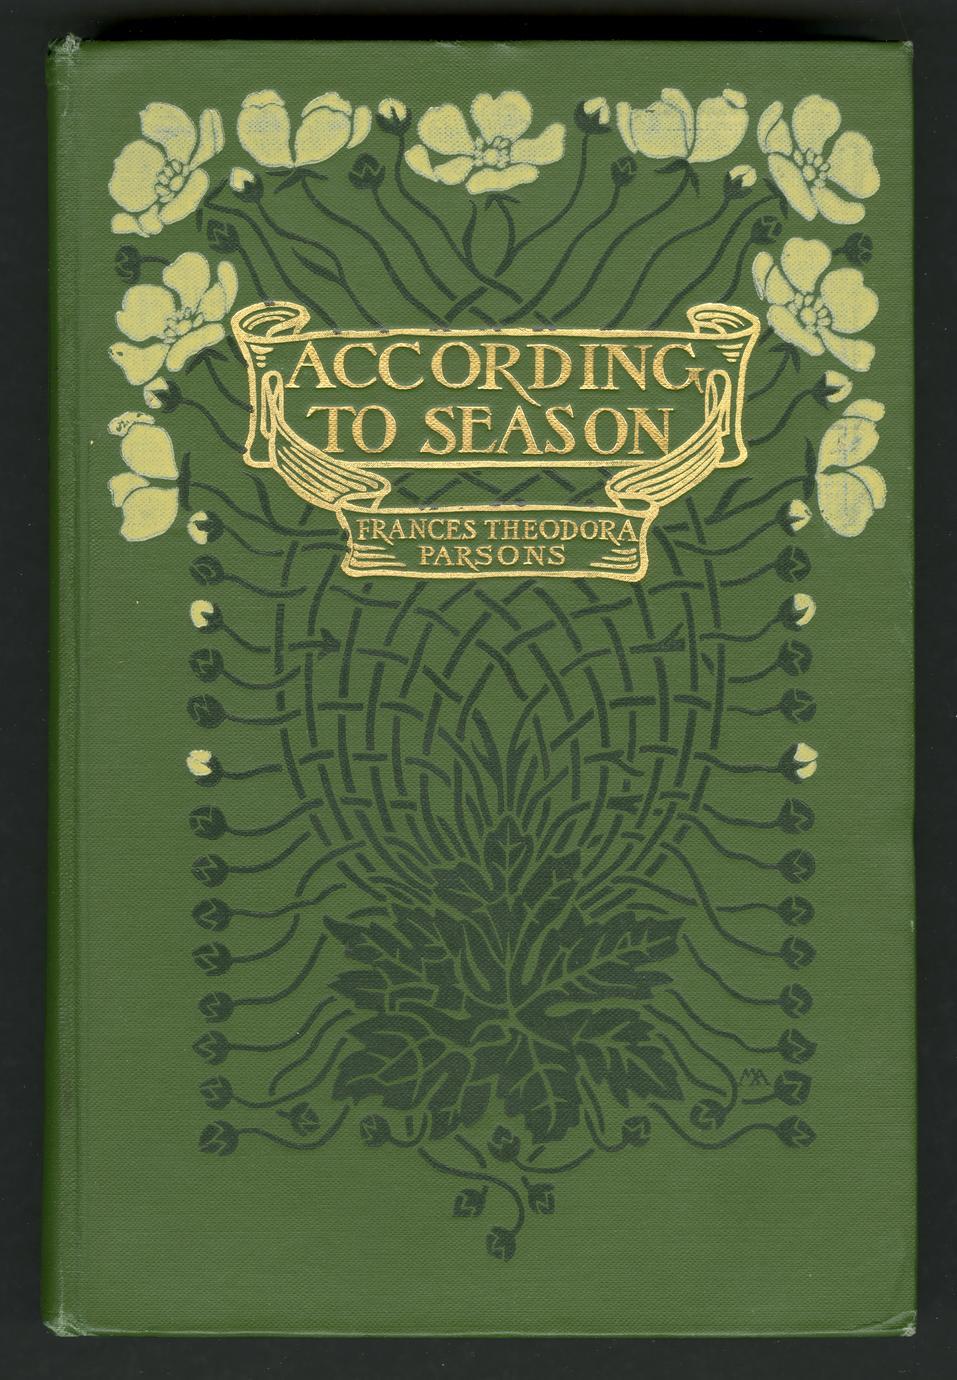 According to season (1 of 3)